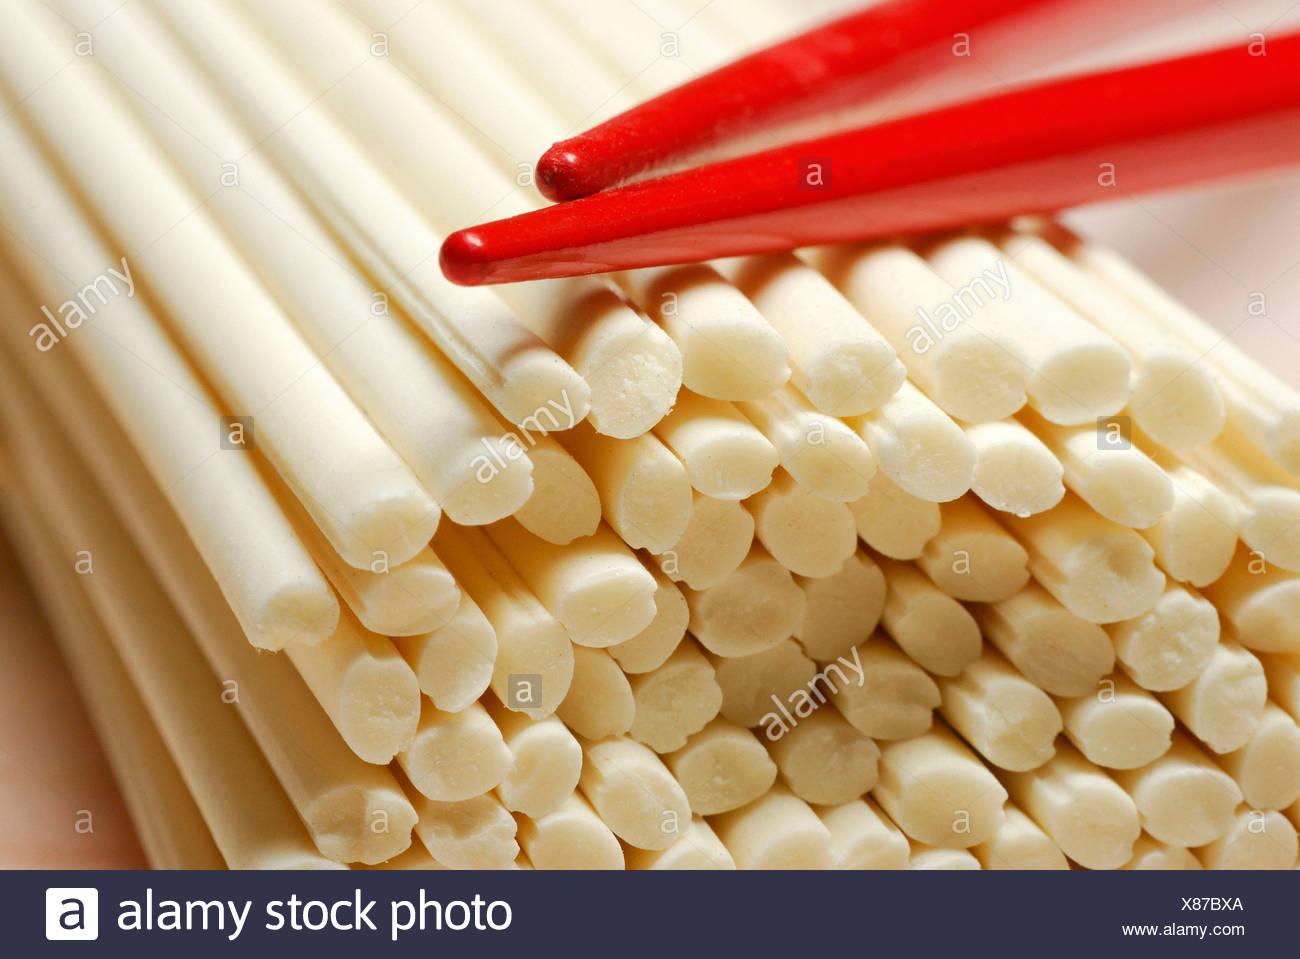 Udon noodles - Stock Image